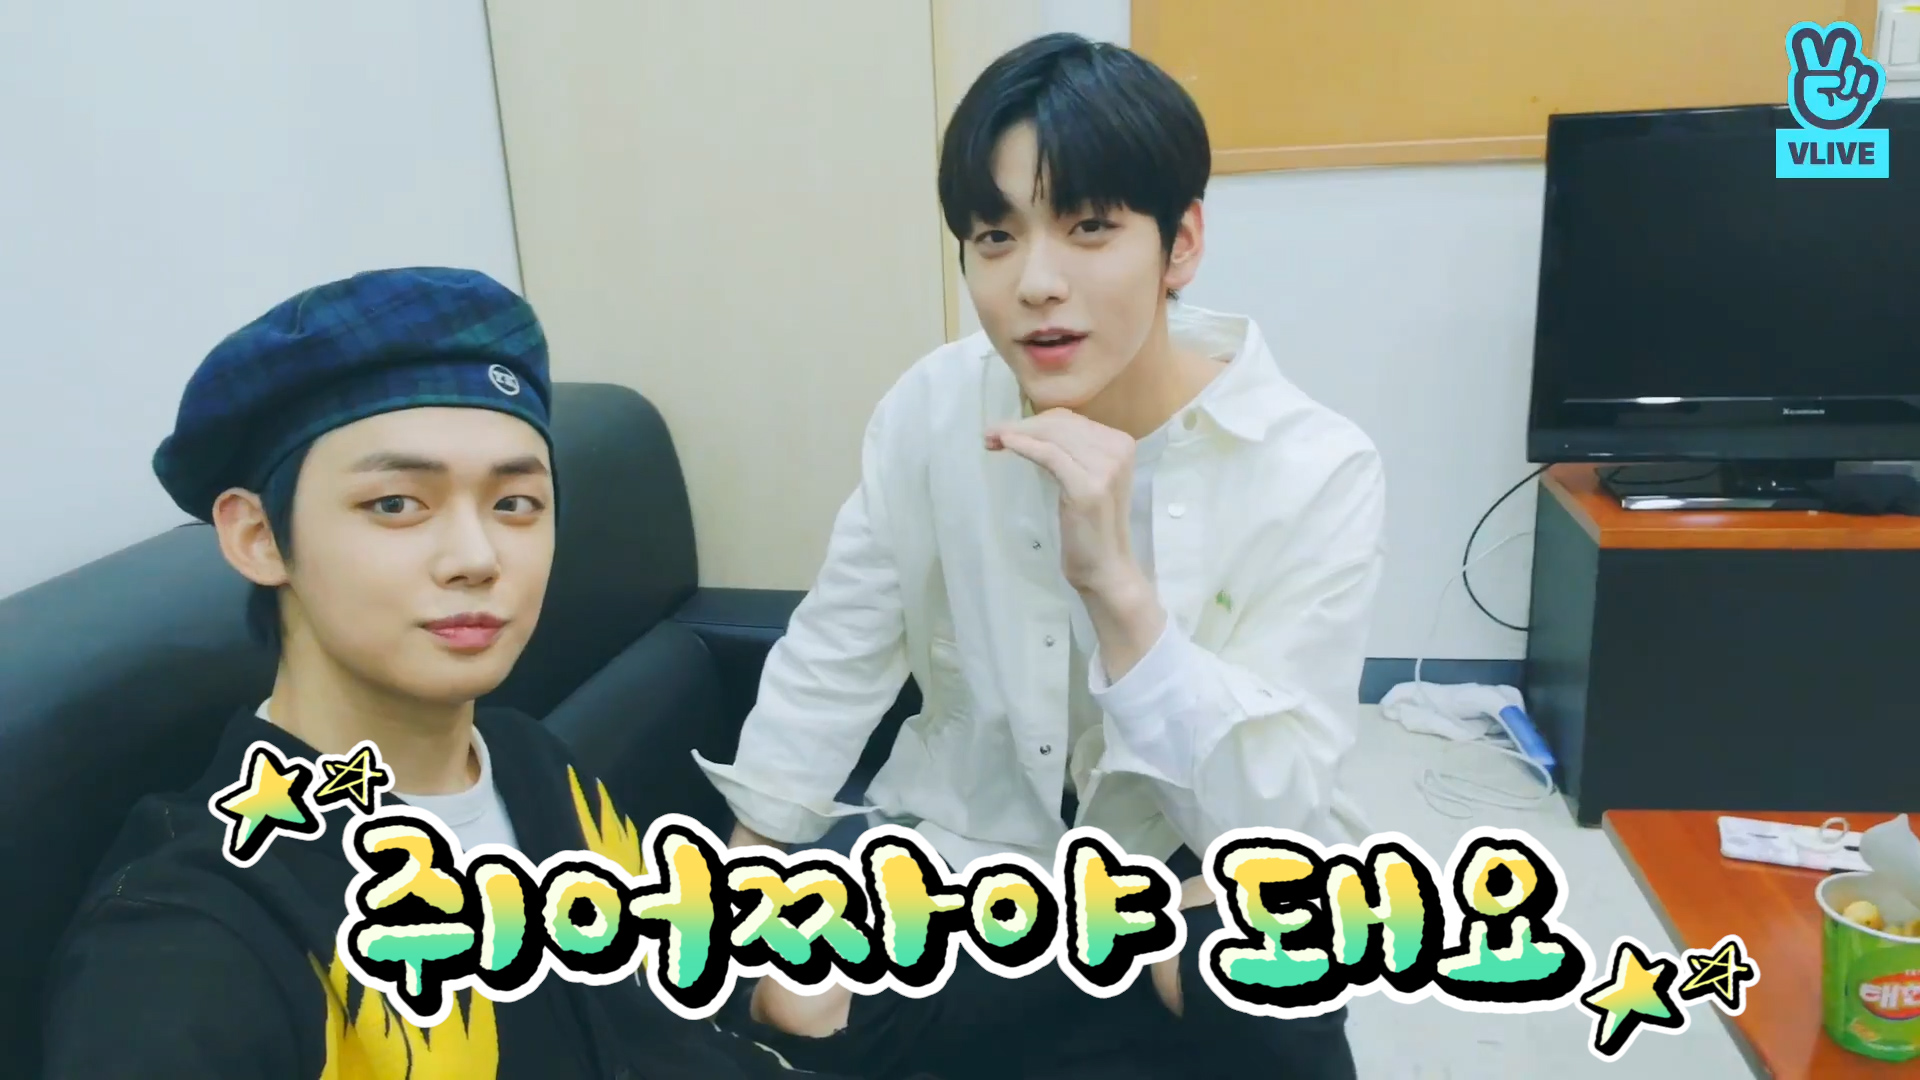 [TXT] 🕺툽을 보면 웨이브 대신 눈물을 쥐어짜게 된다니까요💦 (YEONJUN&SOOBIN teaching choreography of 'Run Away')